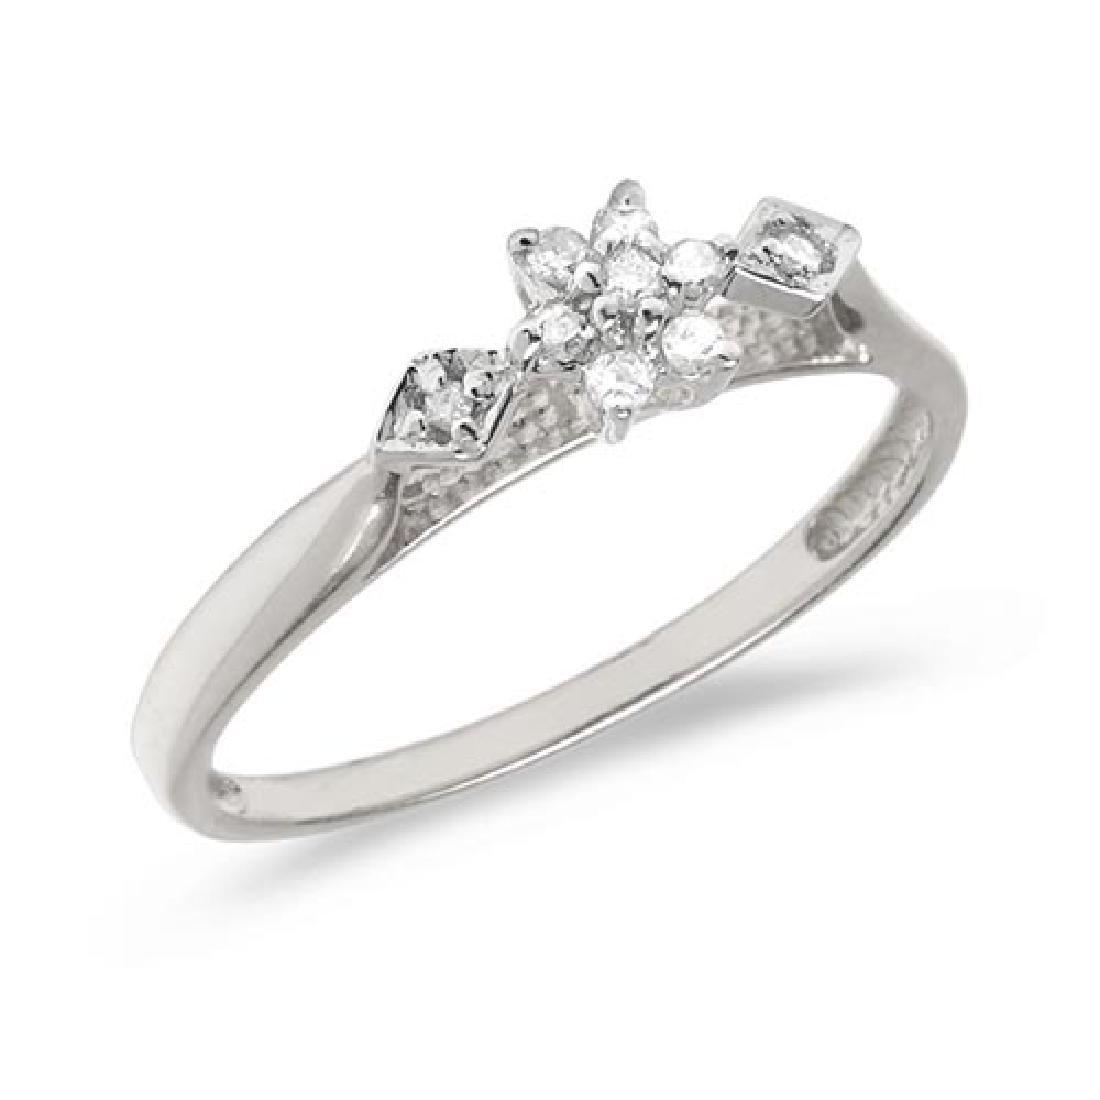 Certified 14K White Gold Diamond Cluster Ring